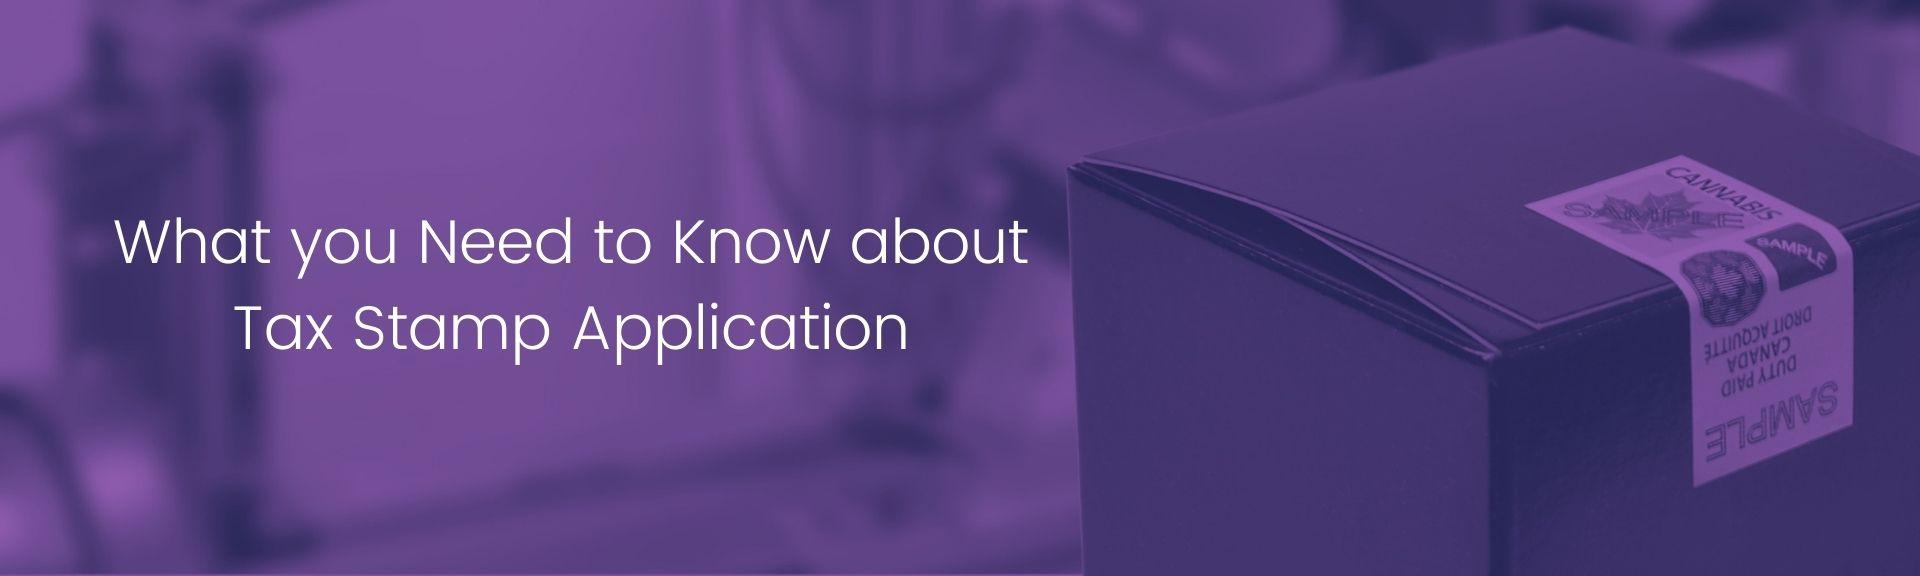 Tax Stamp Application Blog